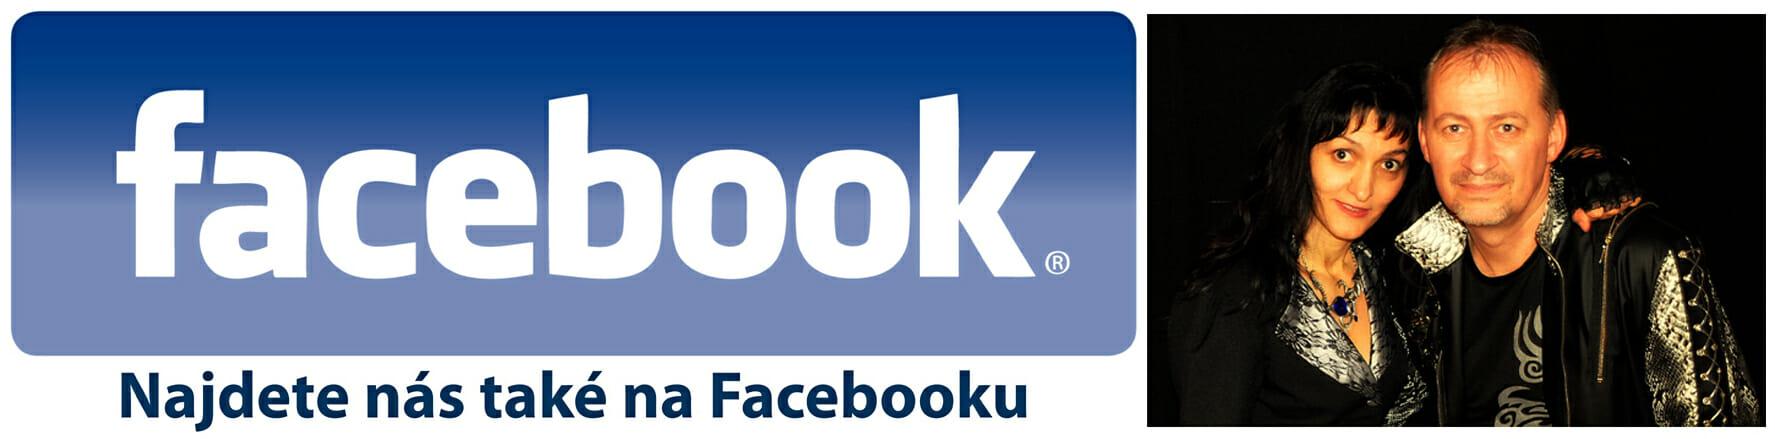 "https://www.facebook.com/duorascals<a href=""https://www.duorascals.com/"">ÚVOD</a>https://www.facebook.com/duorascals"